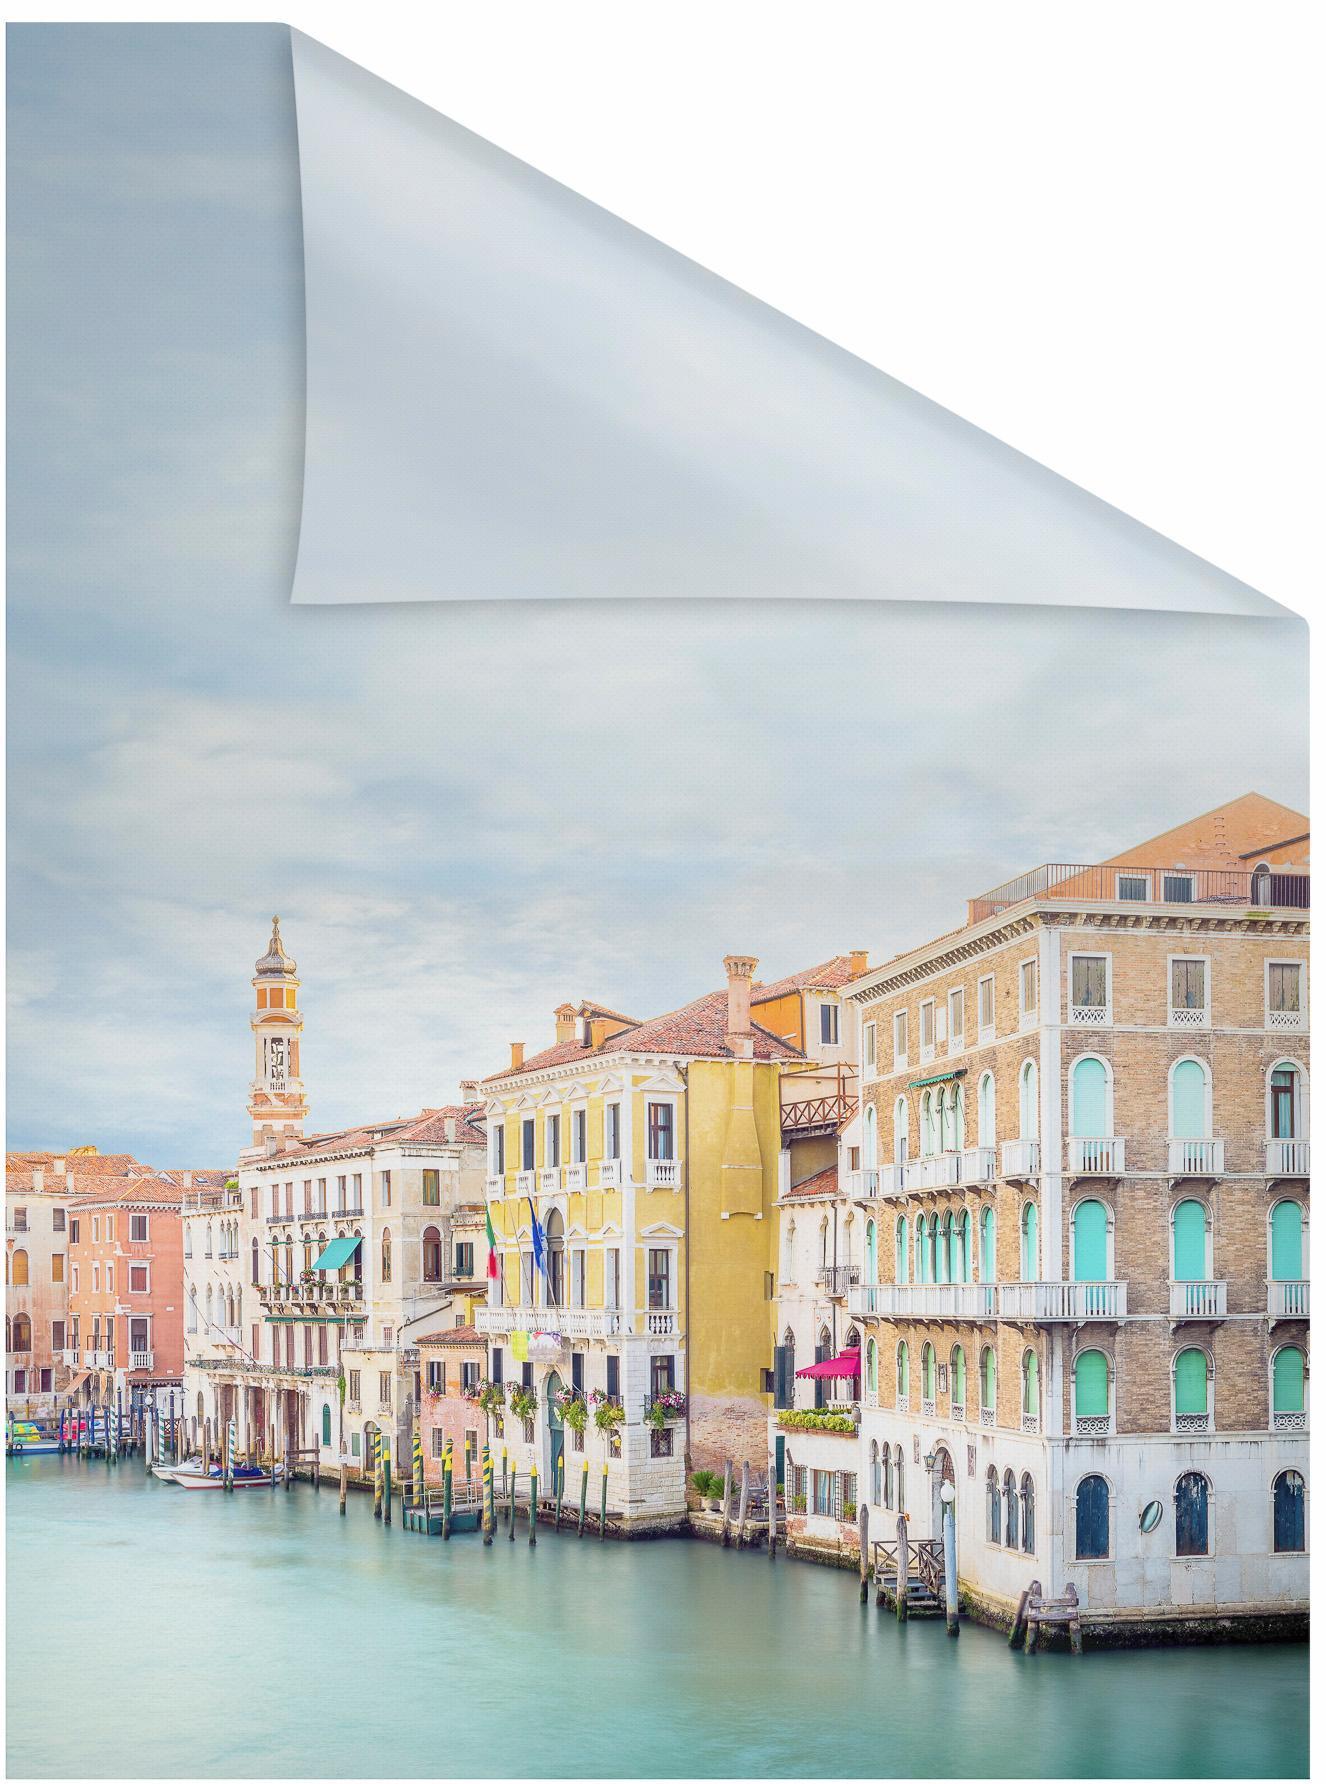 Rabatt fensterfolie vendig lichtblick blickdicht strukturiert - Fensterfolie blickdicht ...